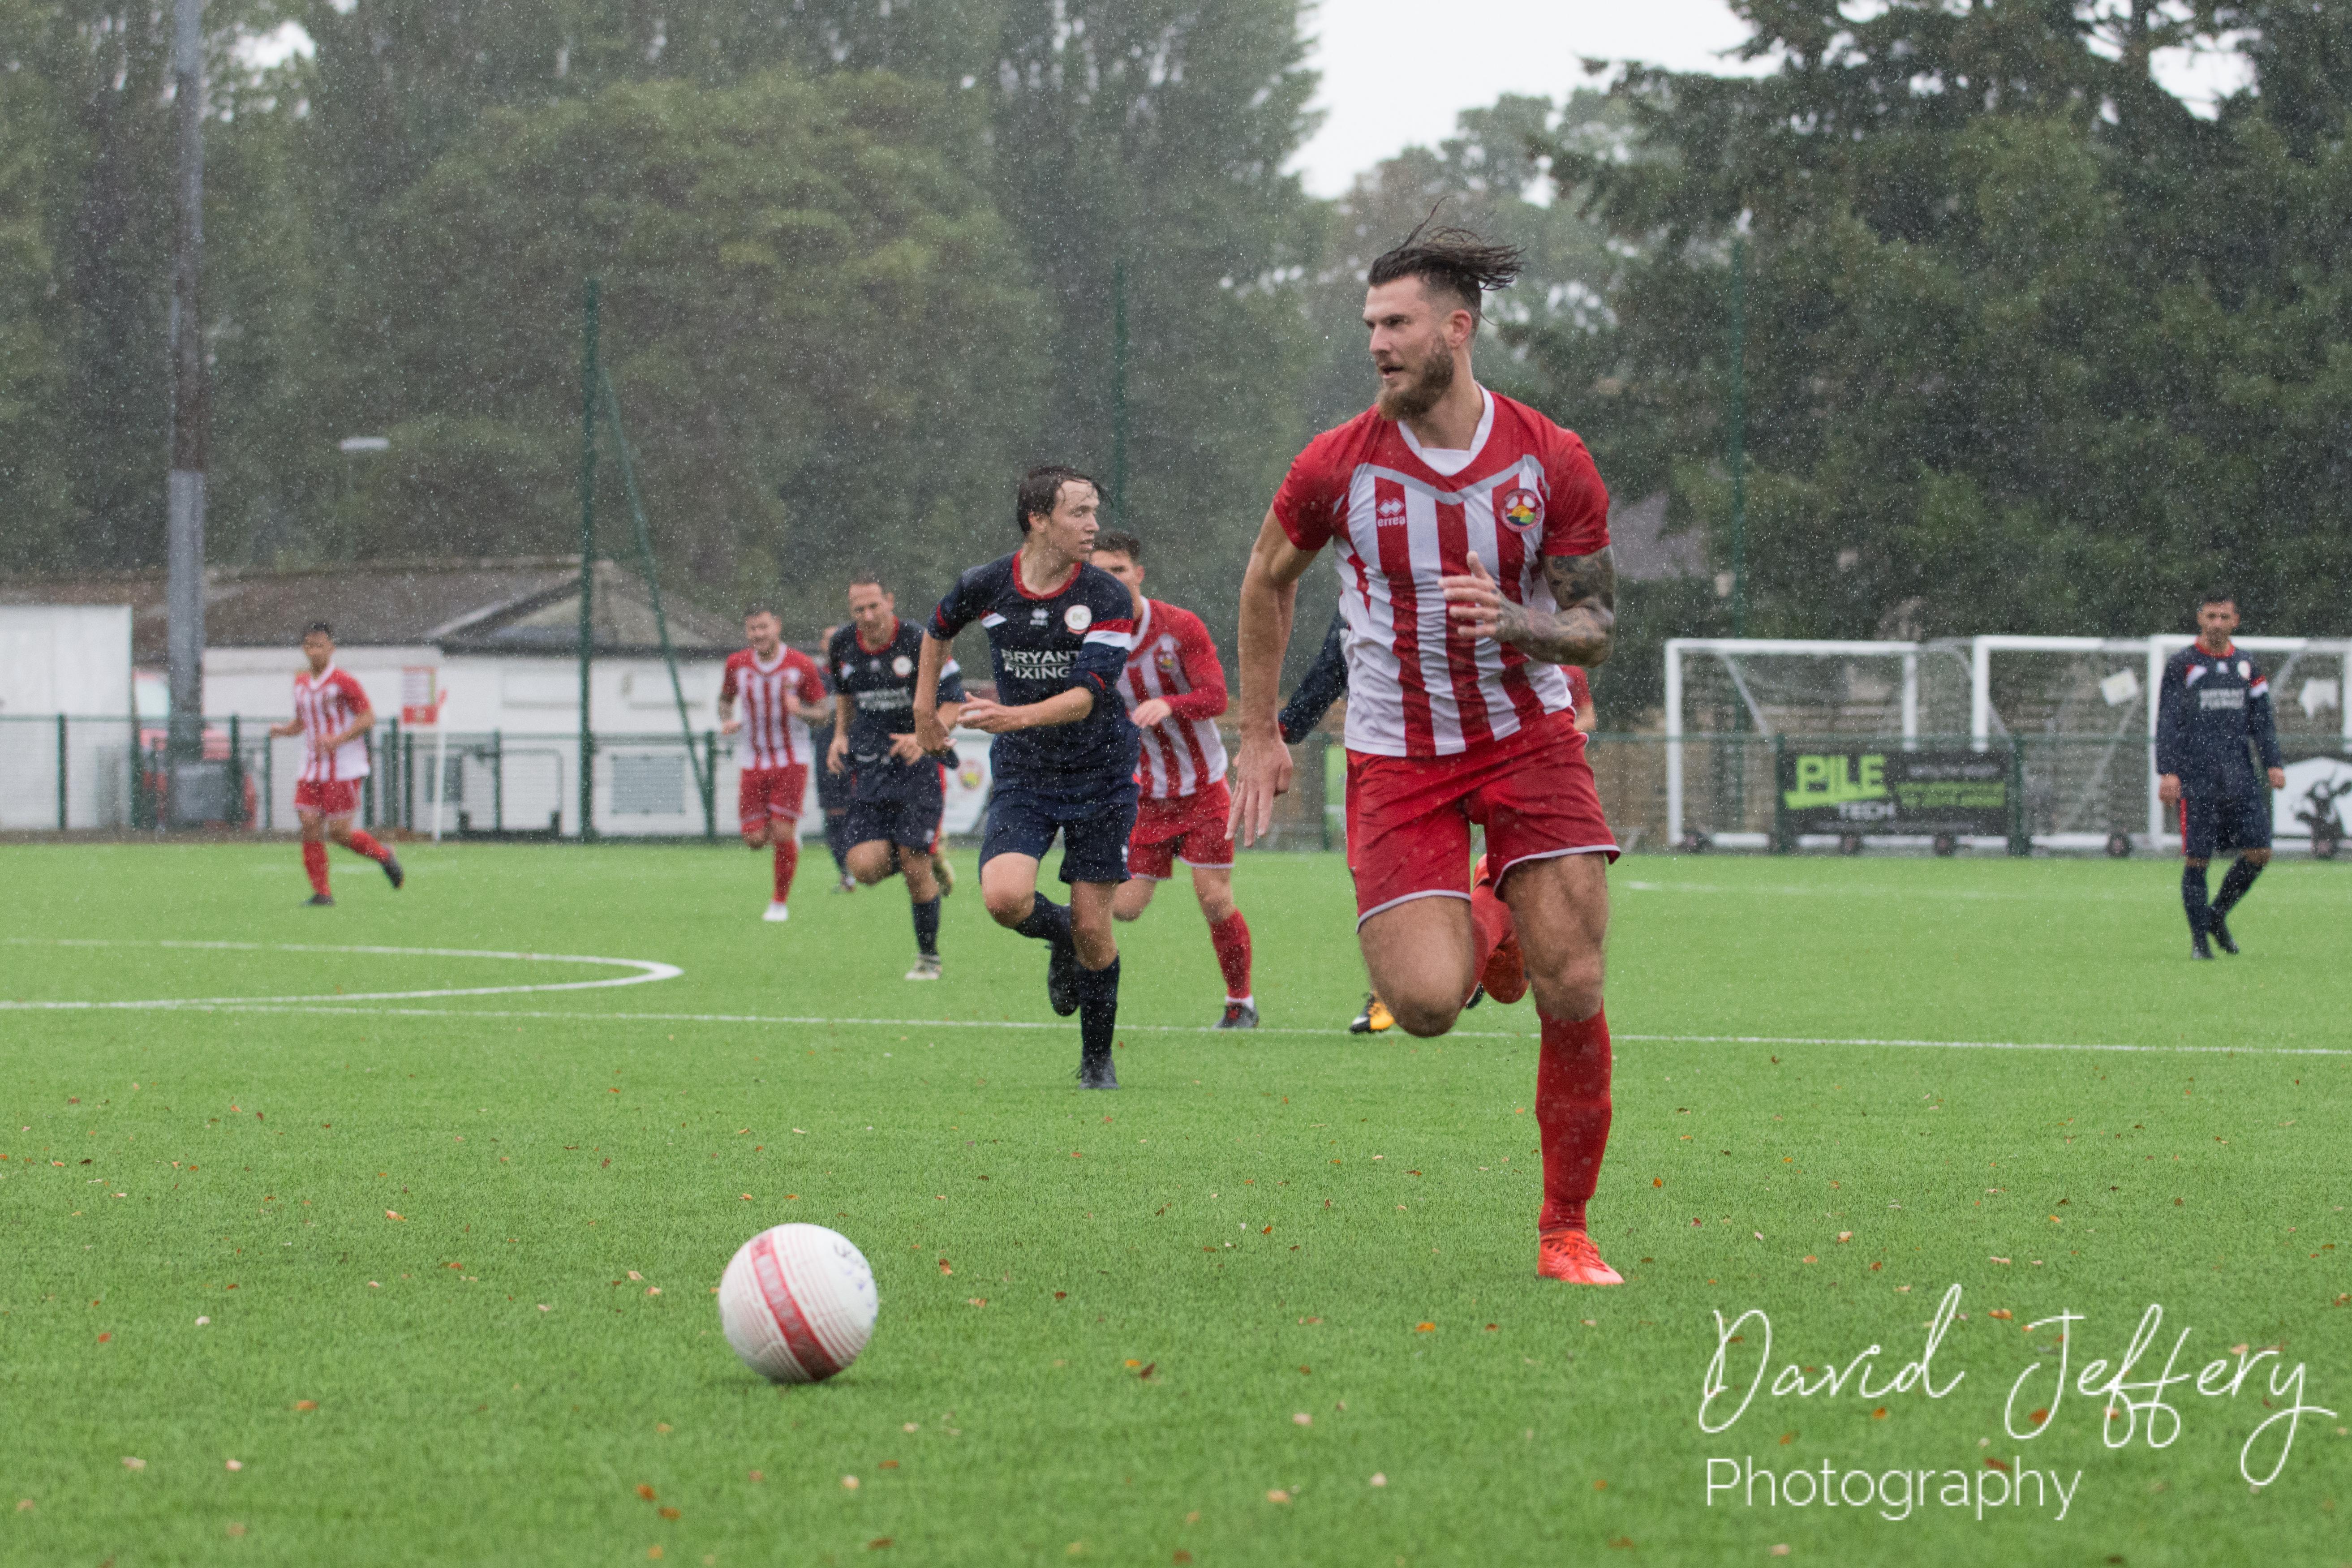 DAVID_JEFFERY Steyning Town FC vs Billin